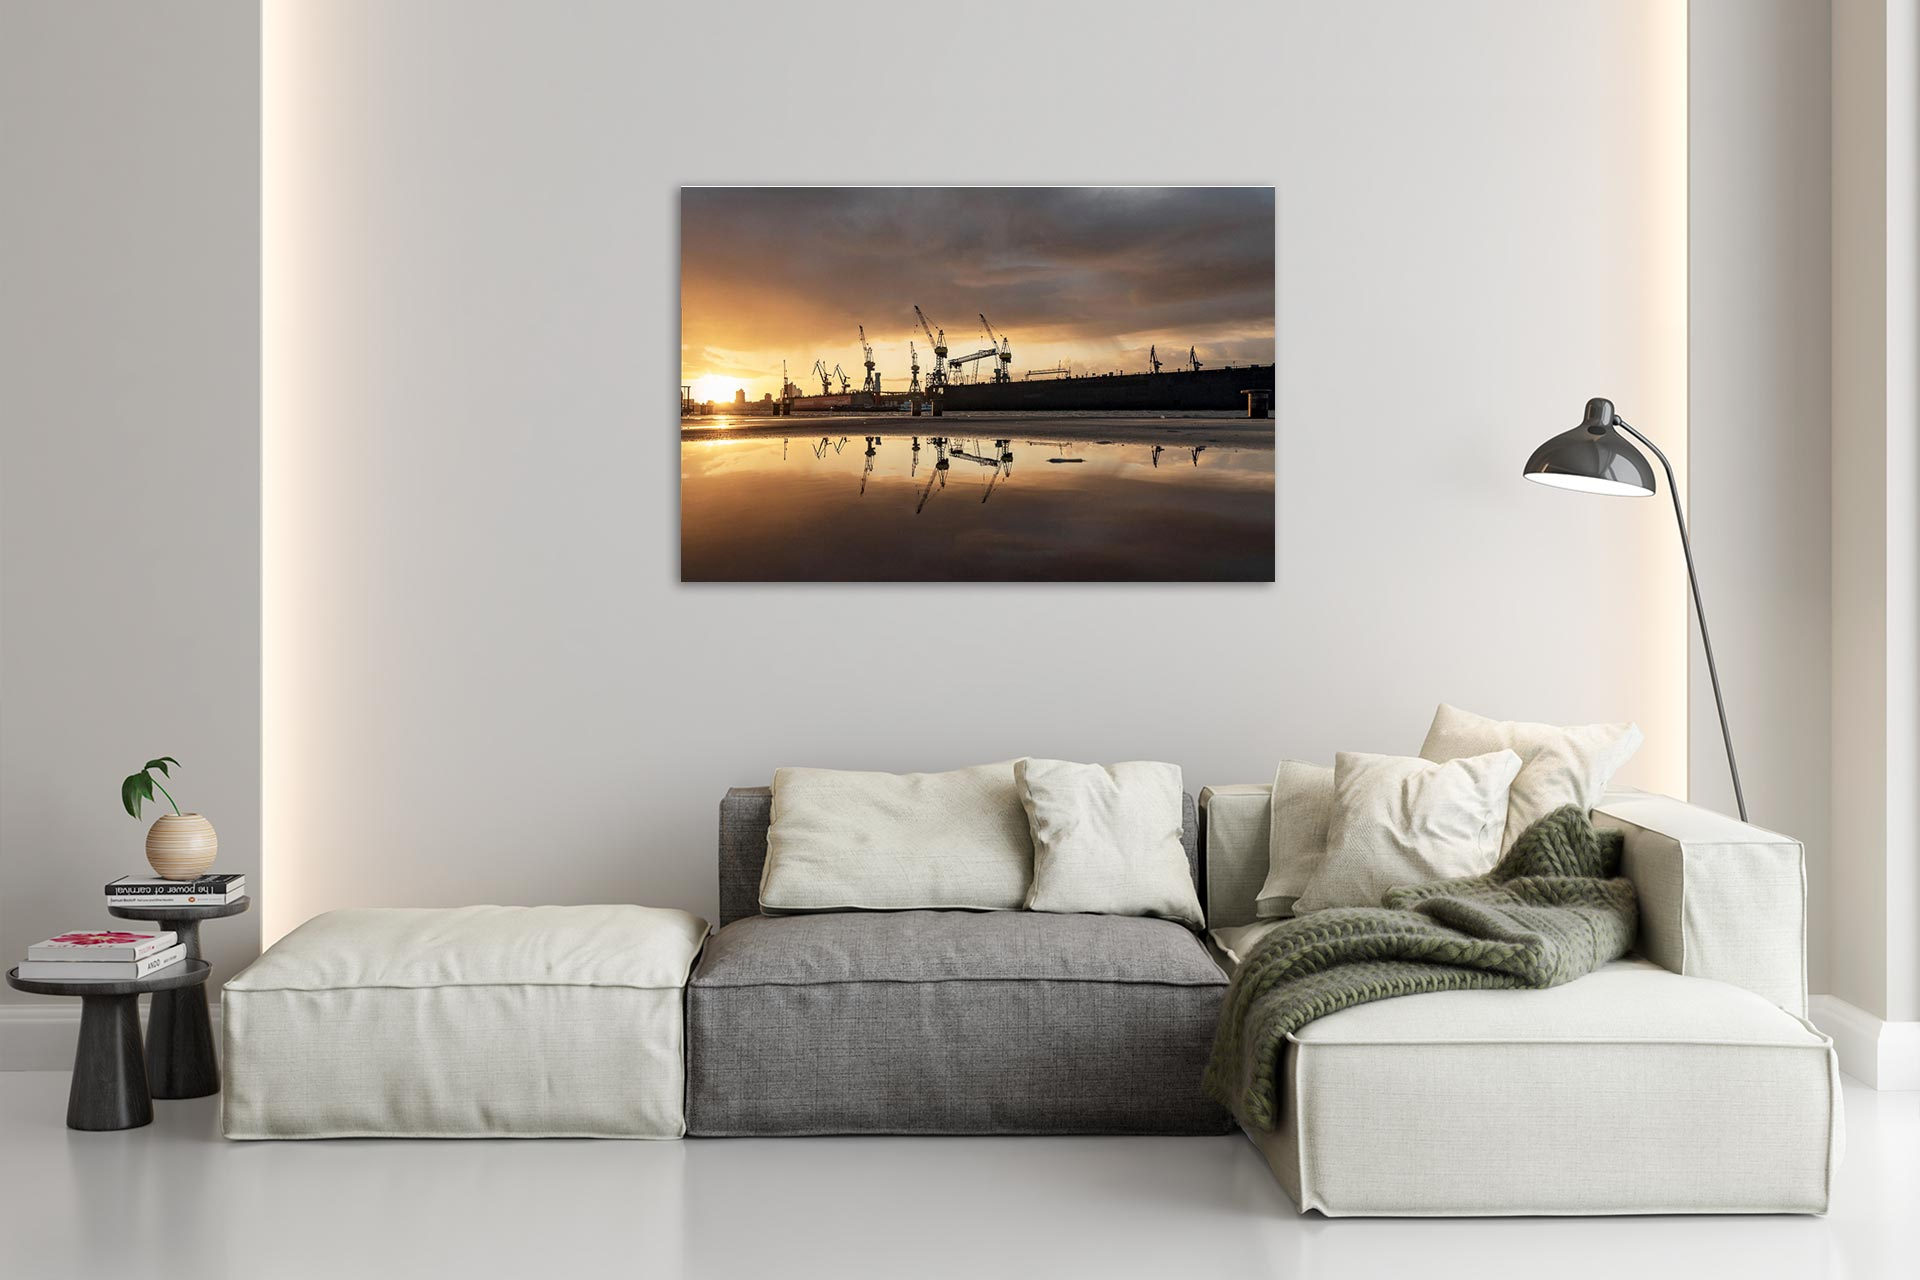 LCW288-flipside-wandbild-bild-auf-leinwand-acrylglas-aludibond-wohnzimmer